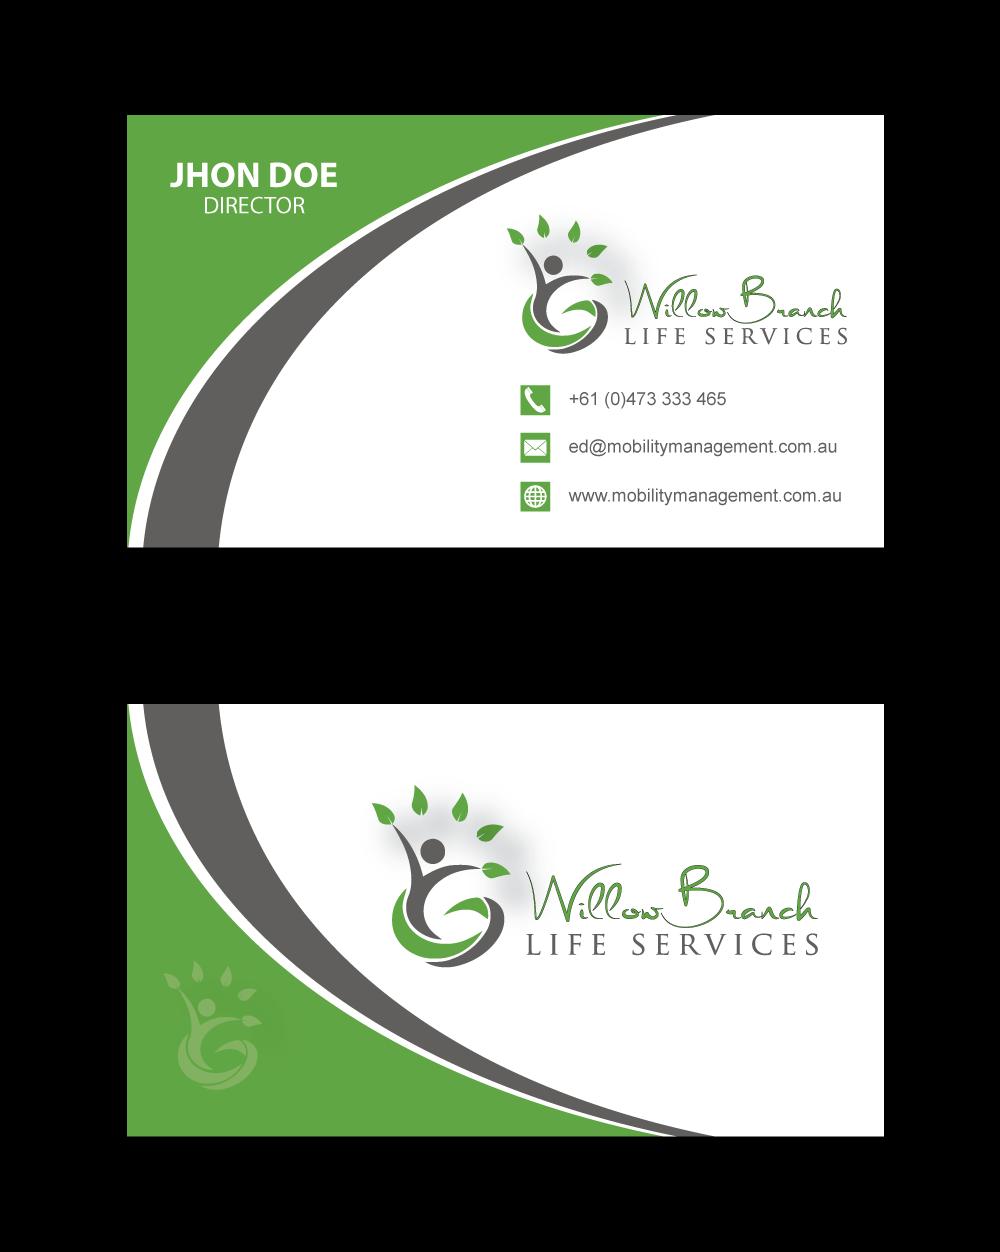 Logo Design by Highexpert Design - Entry No. 428 in the Logo Design Contest Artistic Logo Design for Willow Branch Life Service.